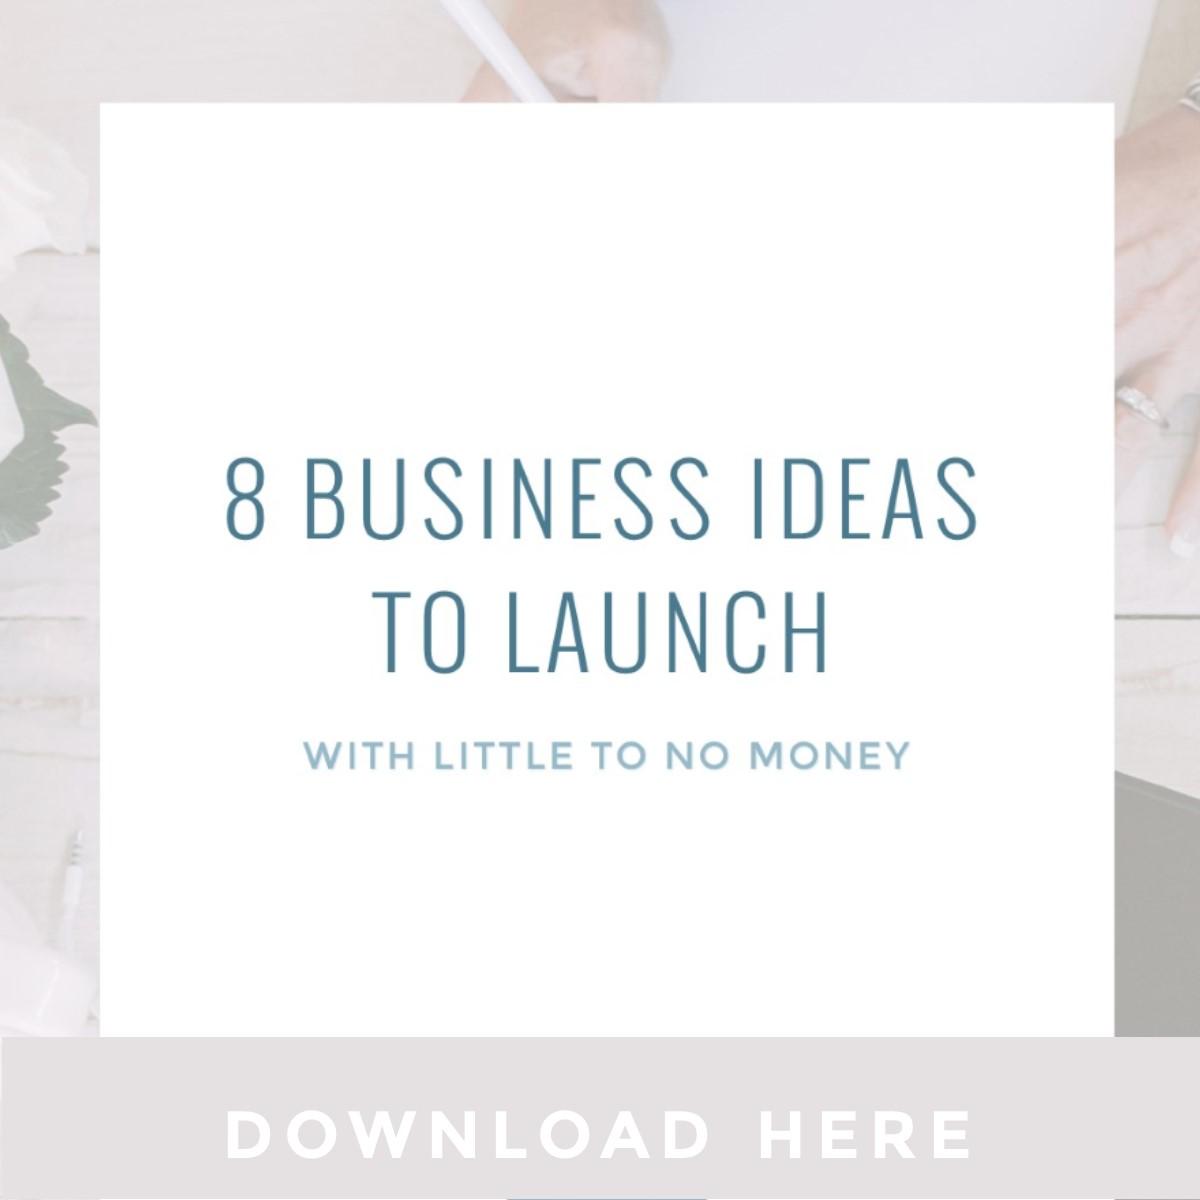 2018-05-14 Biz Ideas Sign Up.jpg